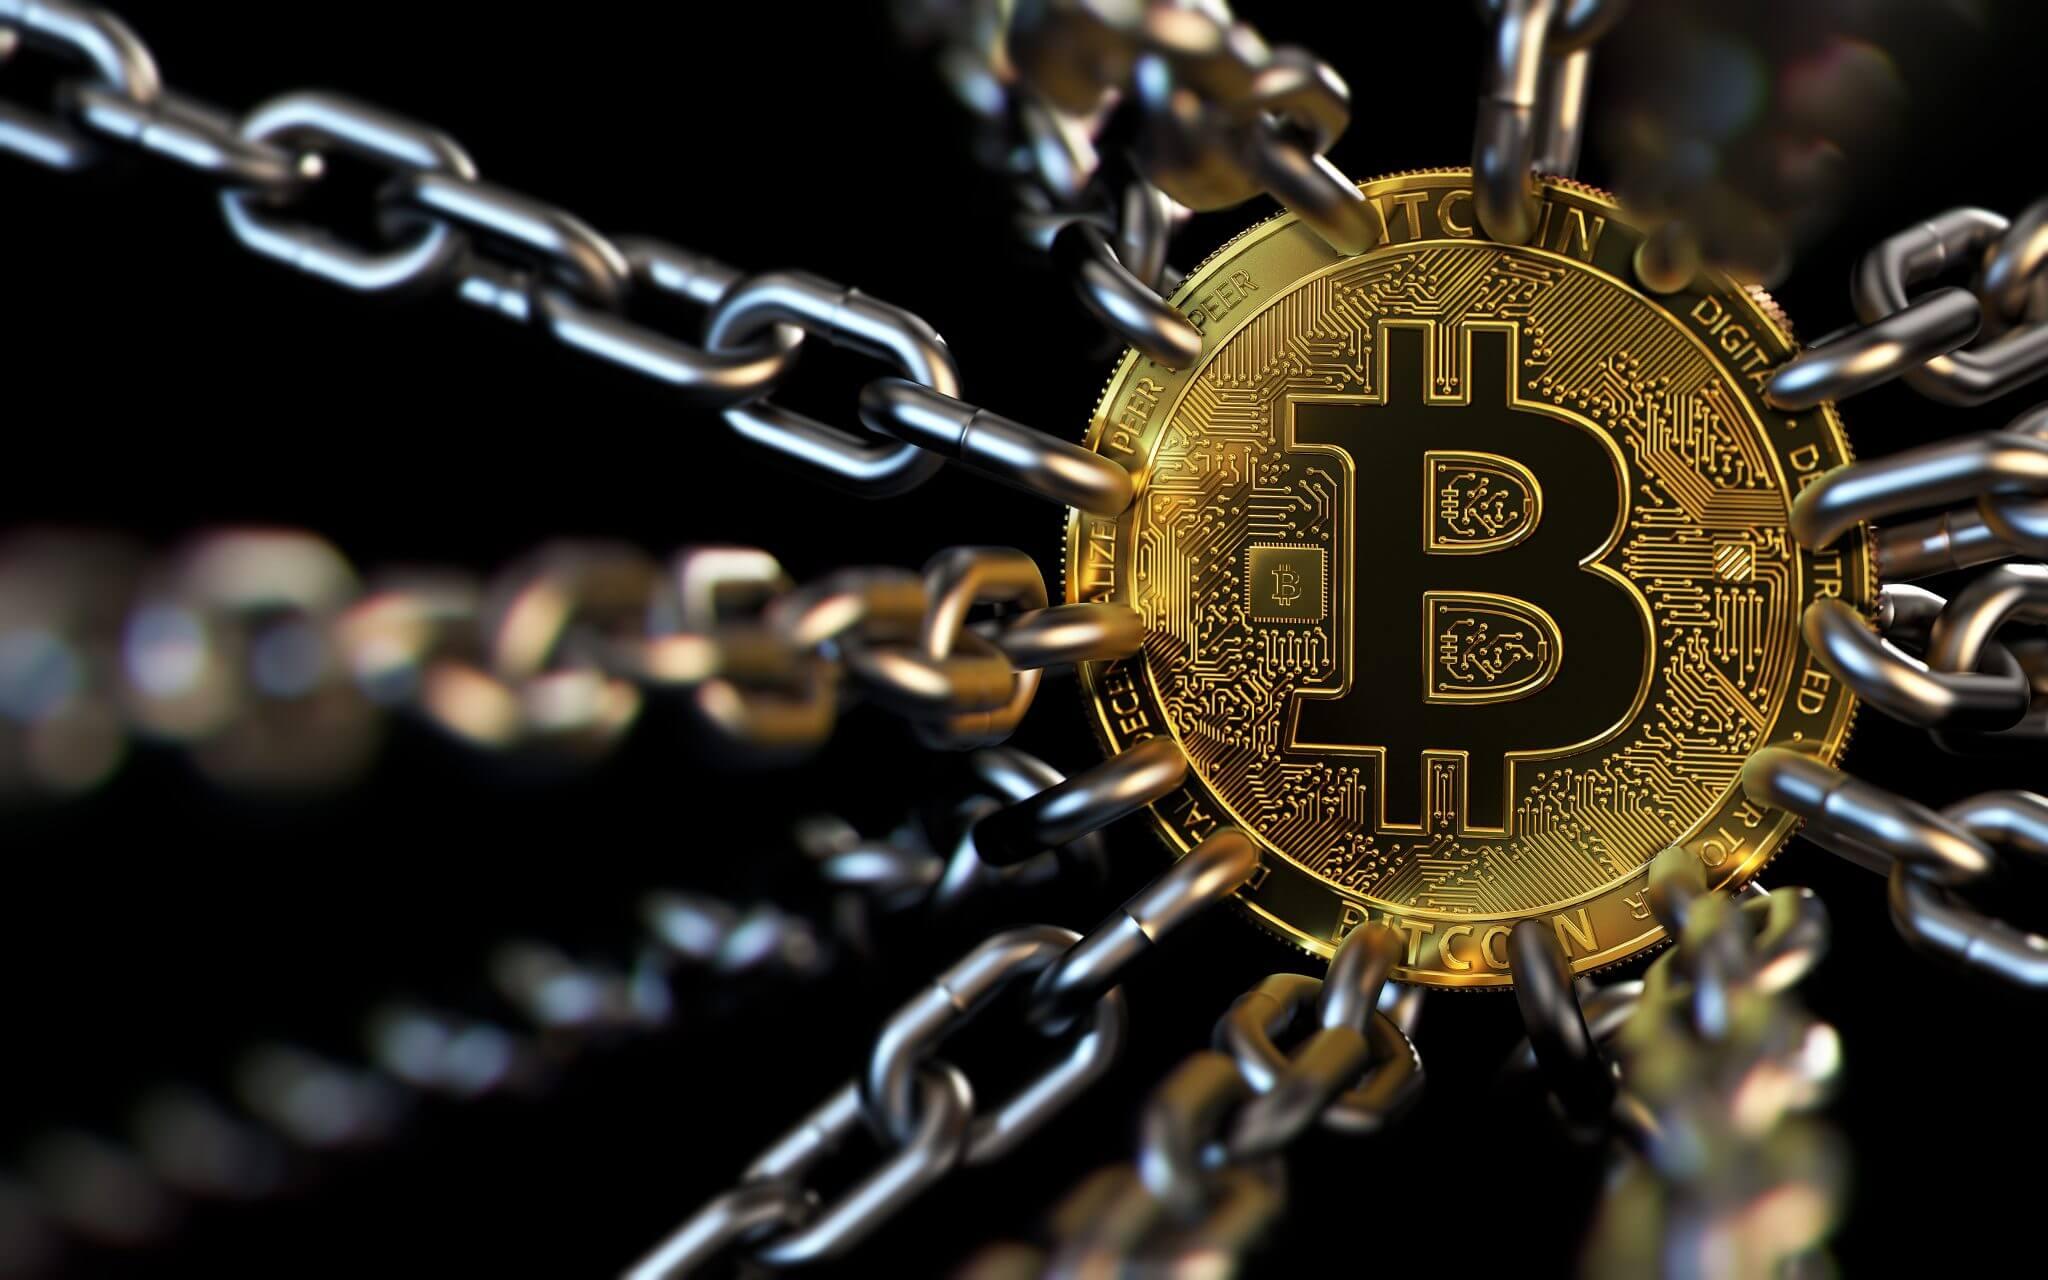 Cryptocurrencies without regulation, Adam Posen says